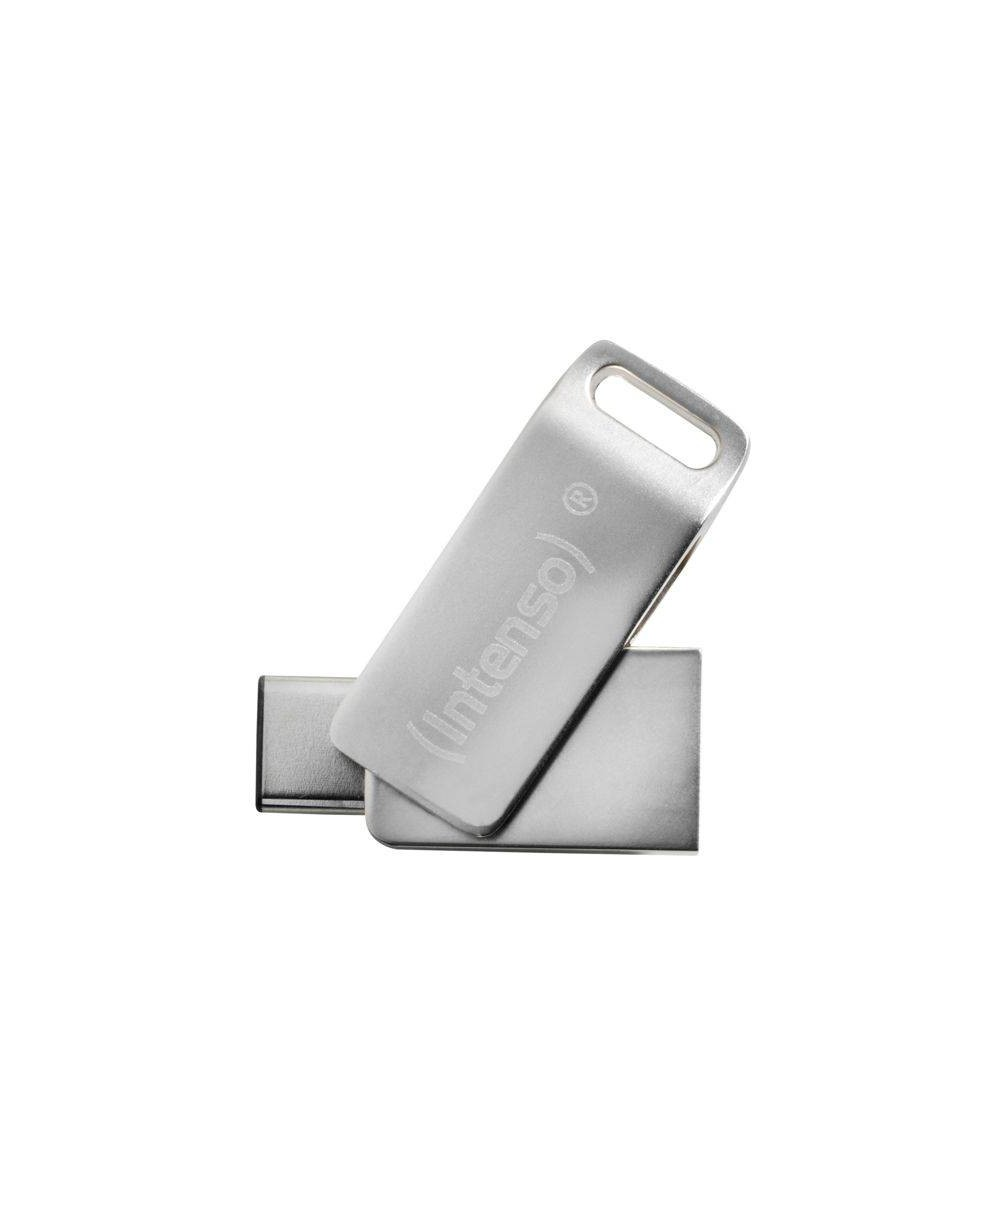 Clé USB Intenso cMobile Line Type C 16GB USB Stick 3.0